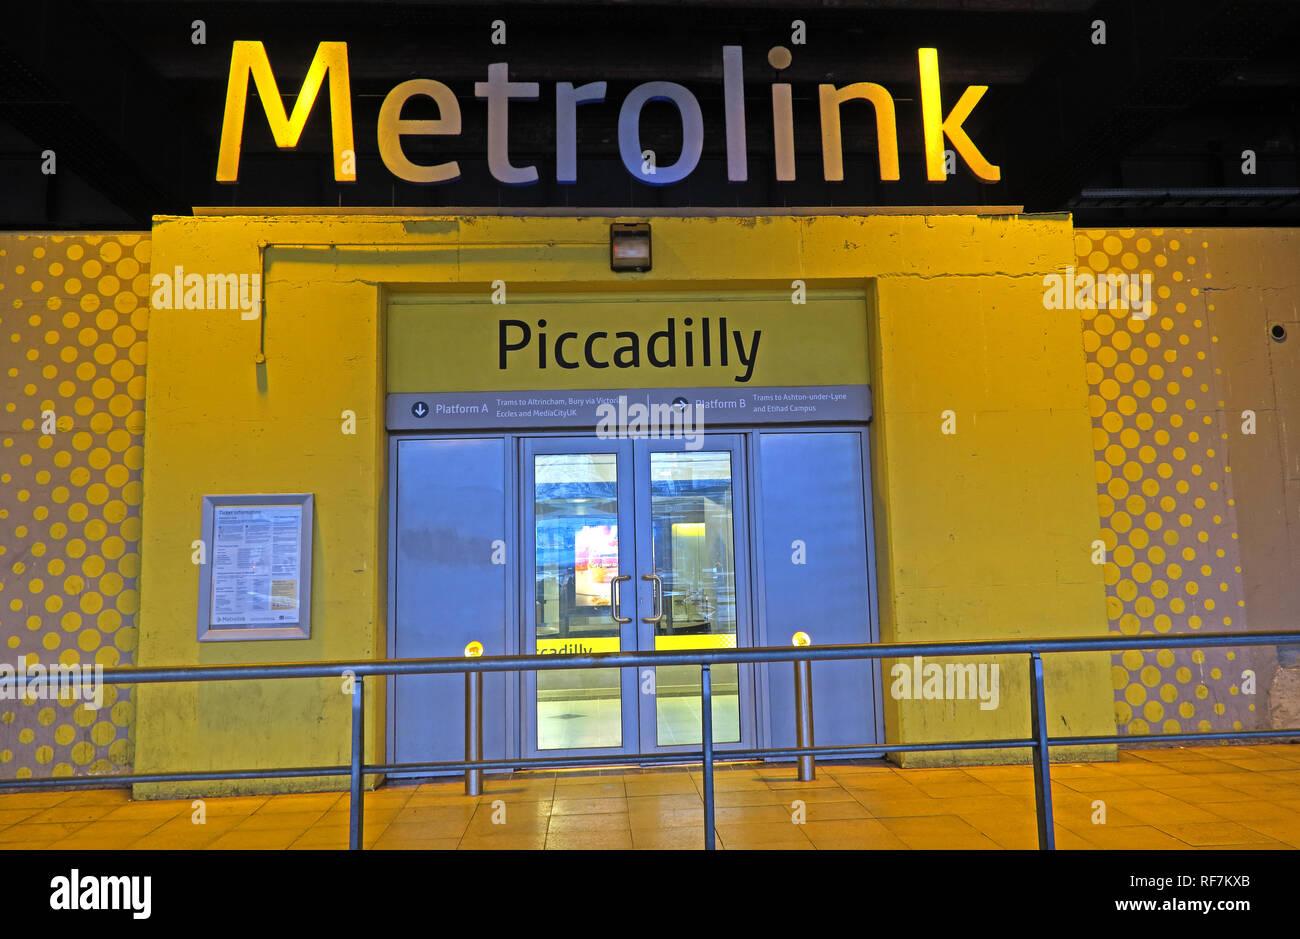 Laden Sie dieses Alamy Stockfoto Piccadilly Manchester Metrolink Tram Interchange, Fairfield, Street, Manchester, M1 2QF - RF7KXB